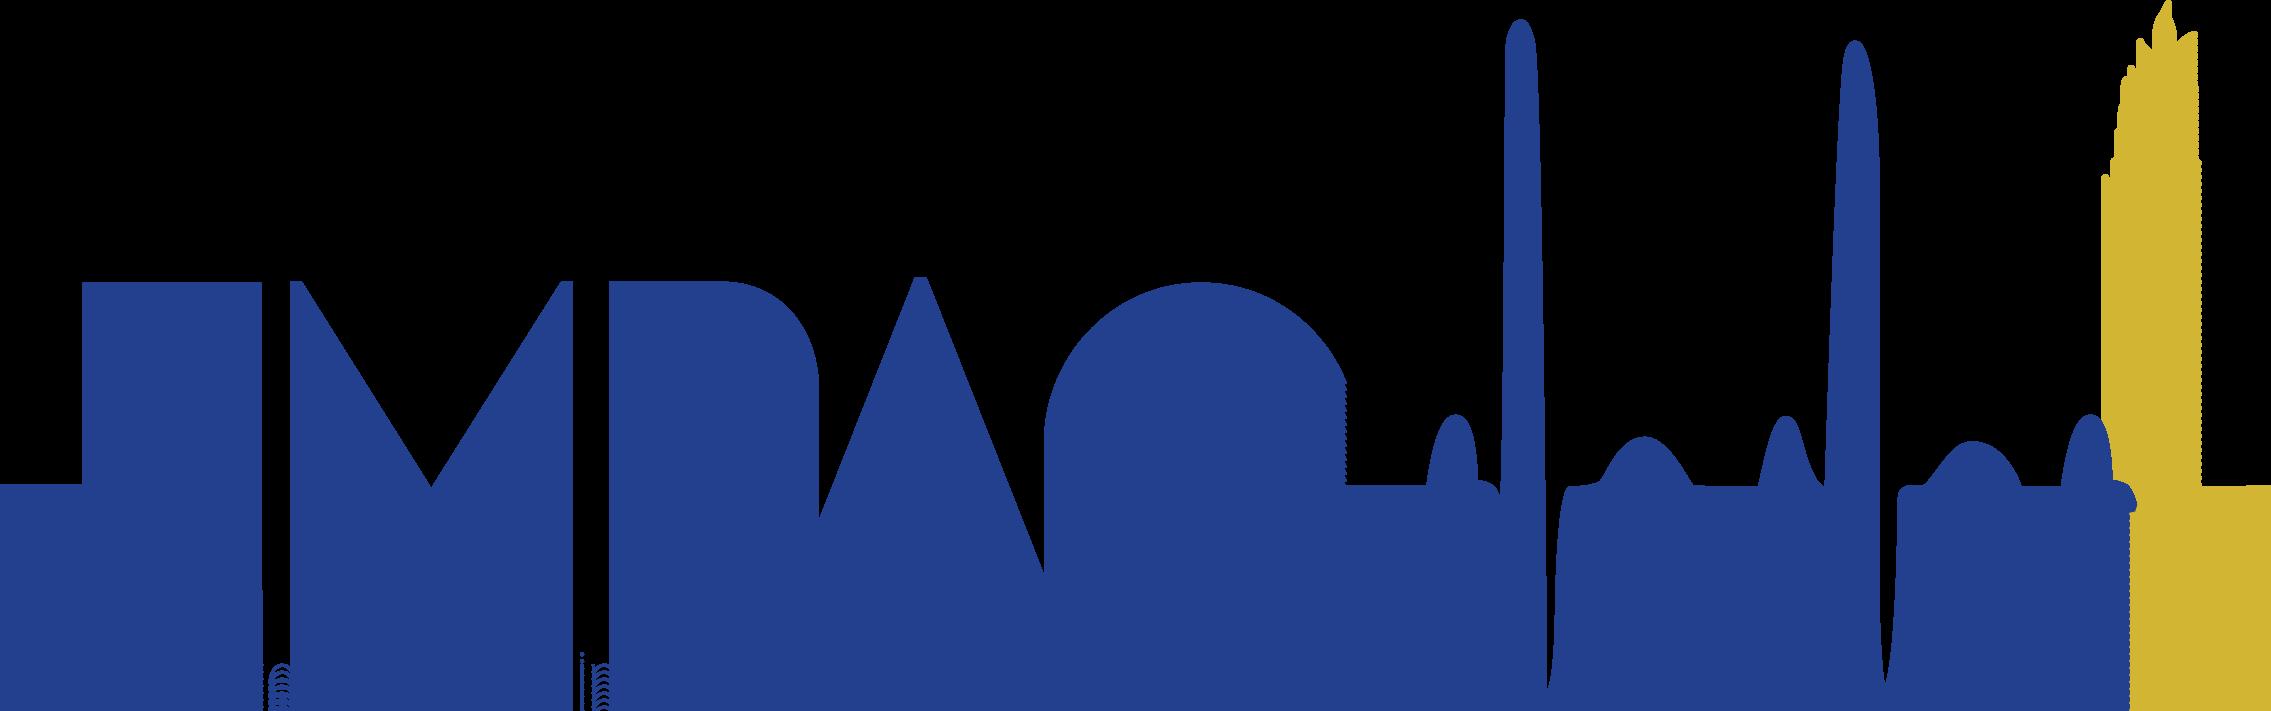 EMPAC - Logo - Medium Mar-16-15 - 3.png